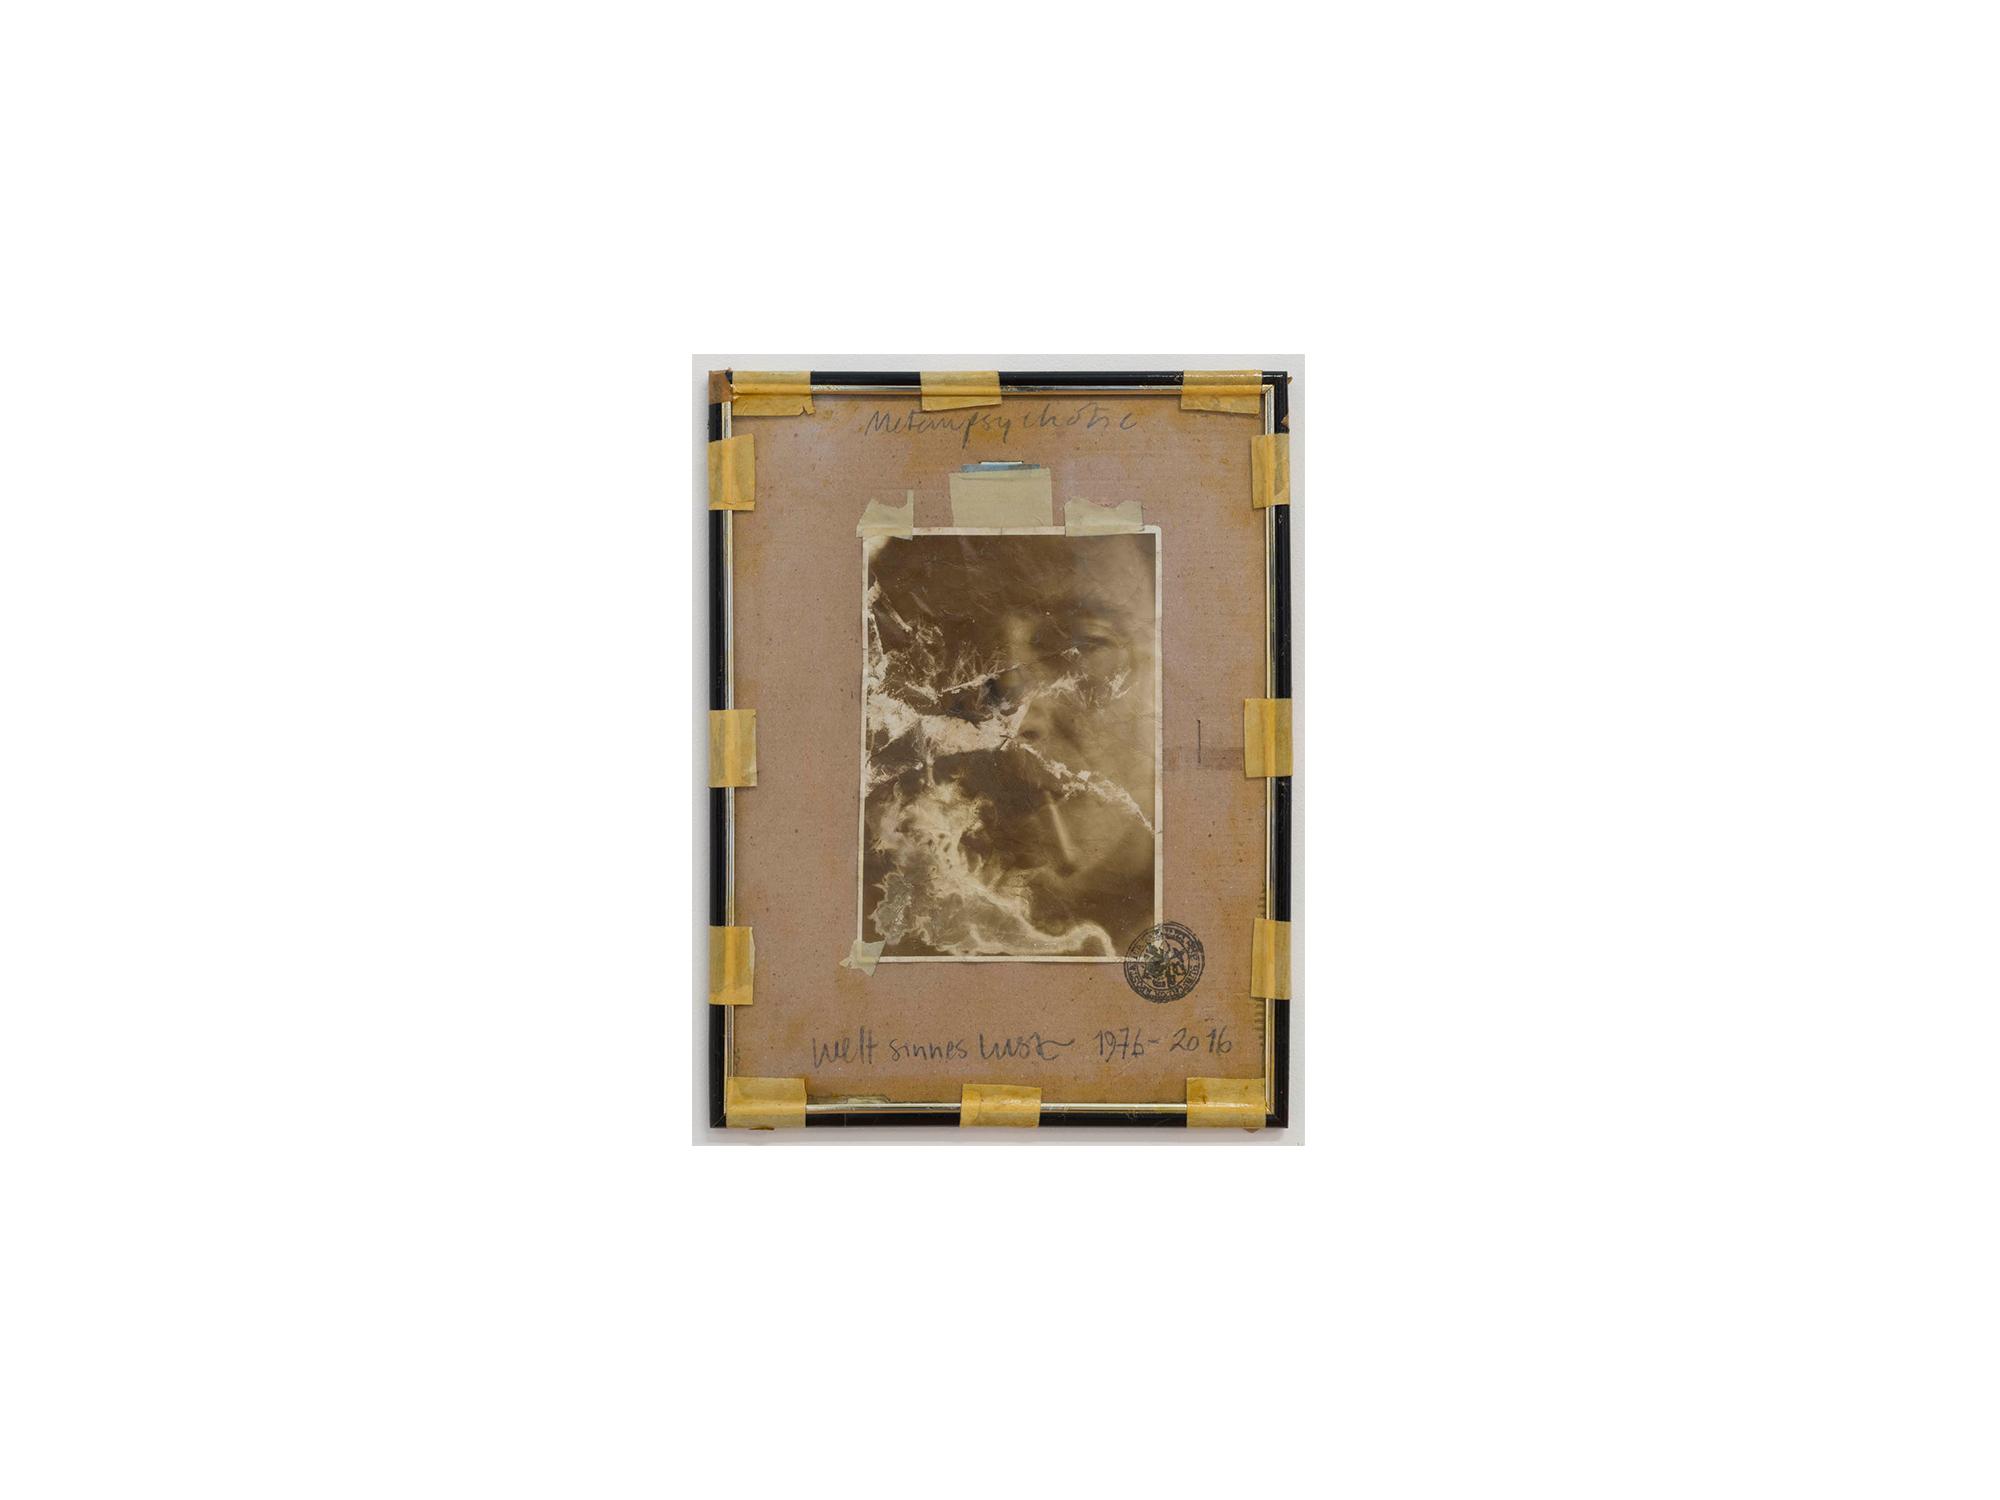 Bernhard Sachs   Metempsychotic , 2016 mixed media on photograph on framed paper 36 x 27cm   ARTIST BIO